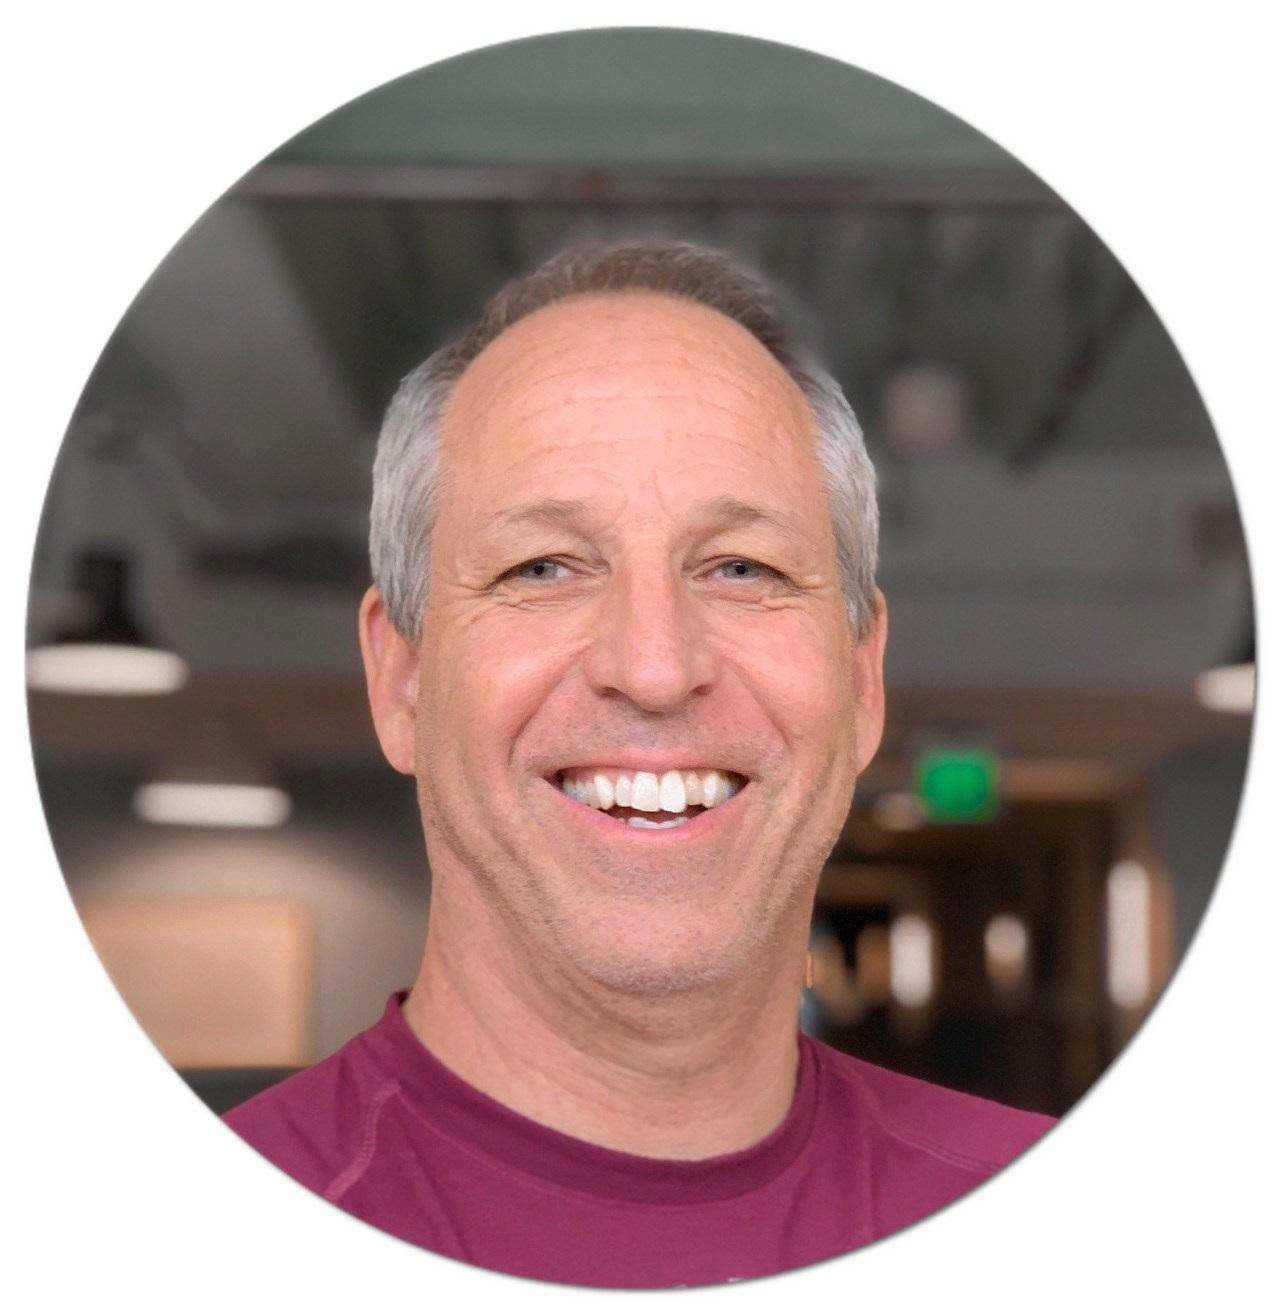 Mario Kaack - Tech Support Engineer